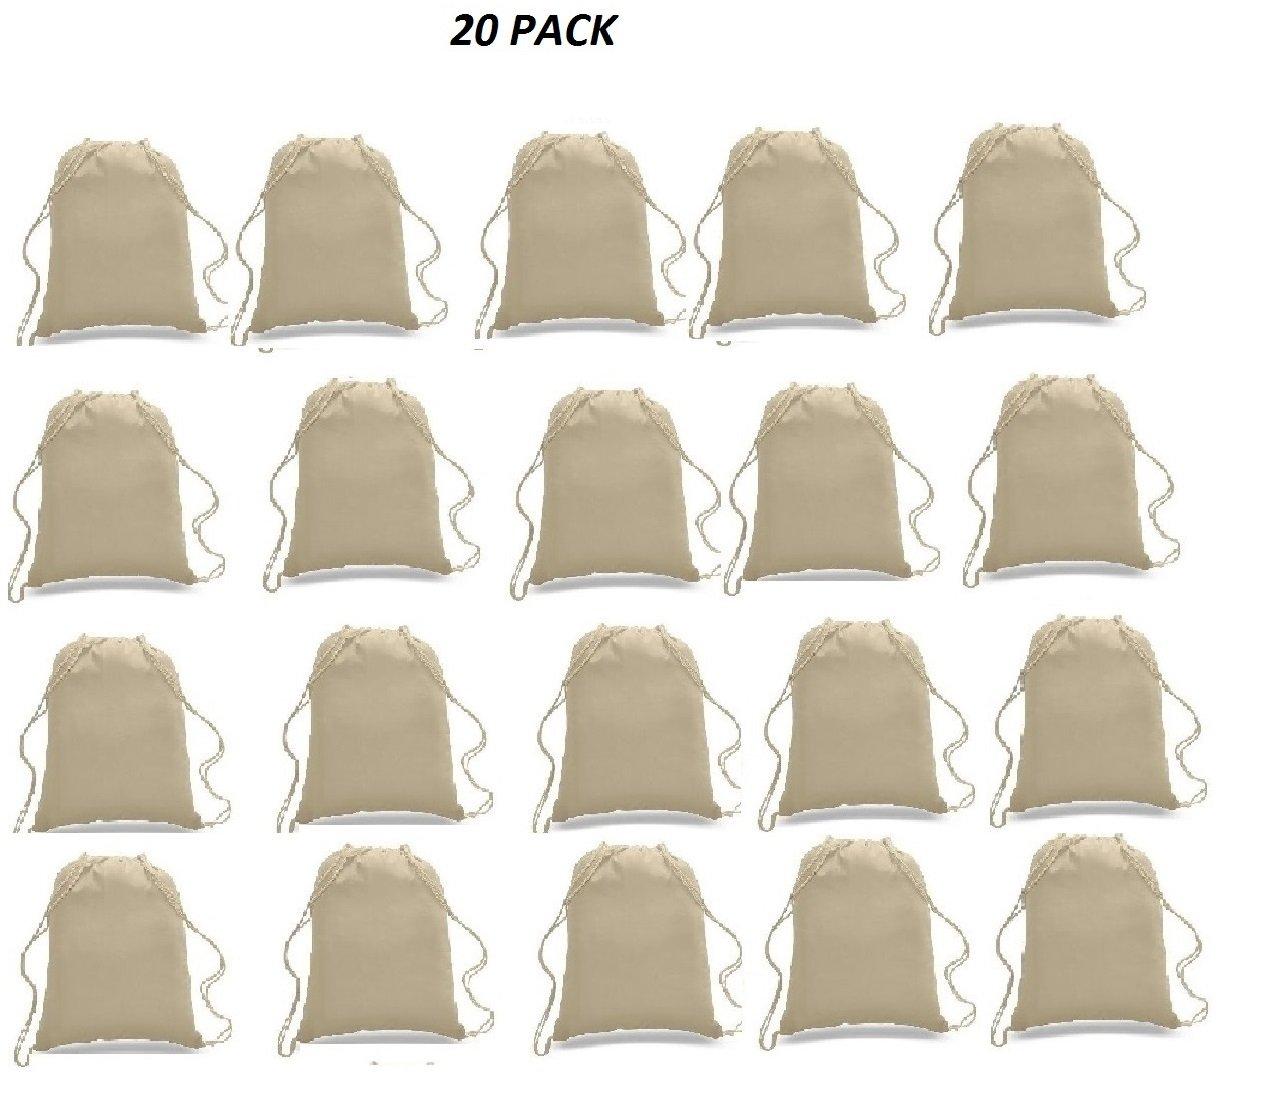 90dbfc693700 Amazon.com: SHOPINUSA Buy Bulk (10 PACK) Eco Friendly- Promotional ...